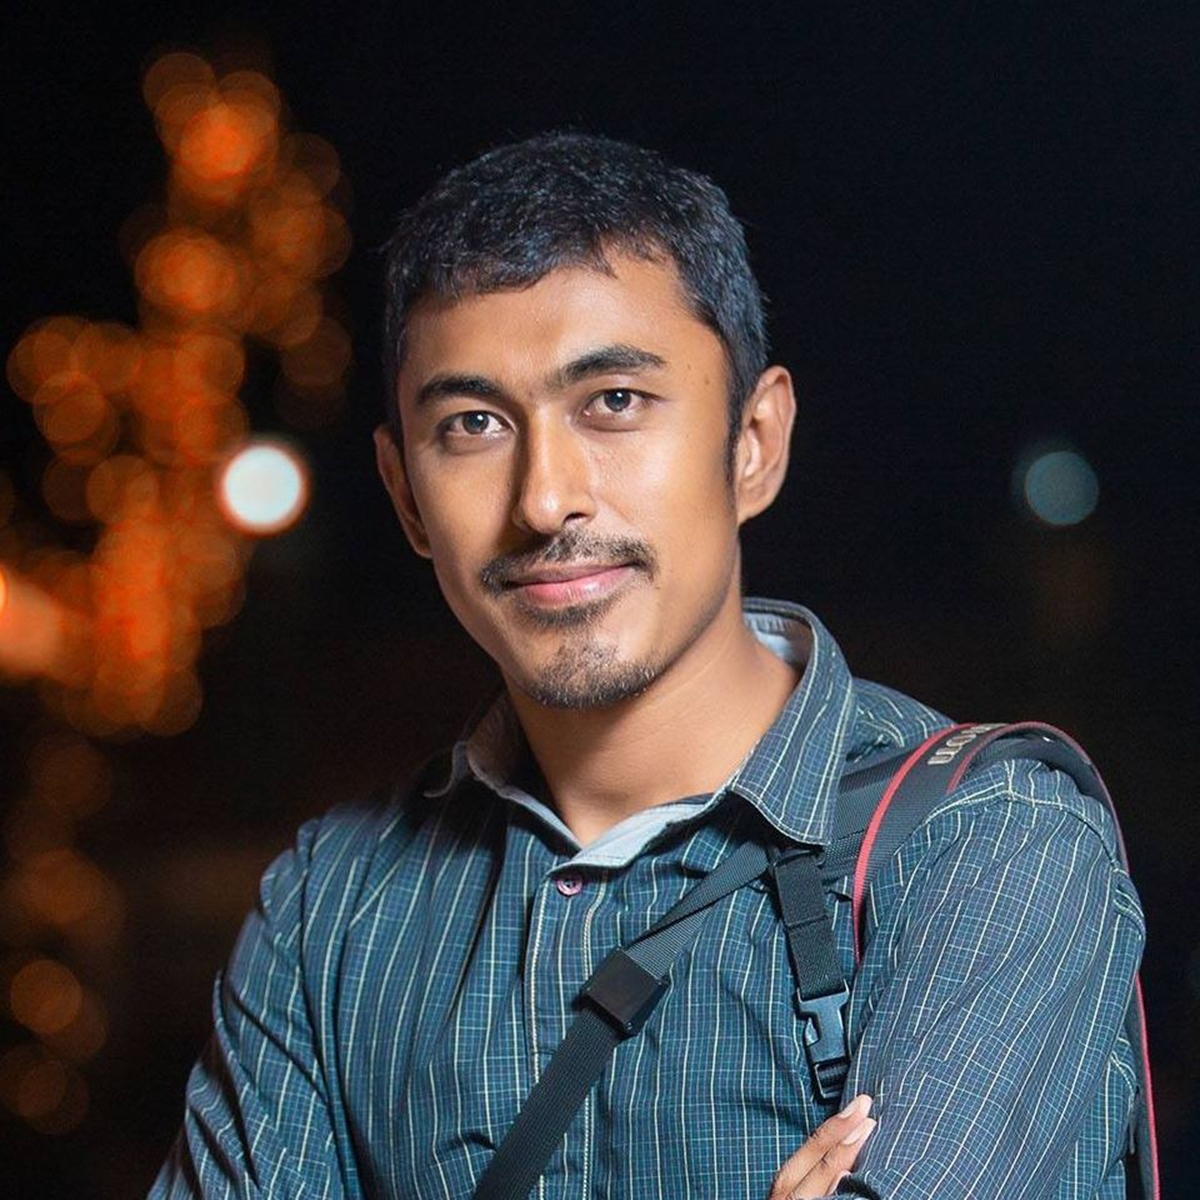 Photographer Bibek Shrestha